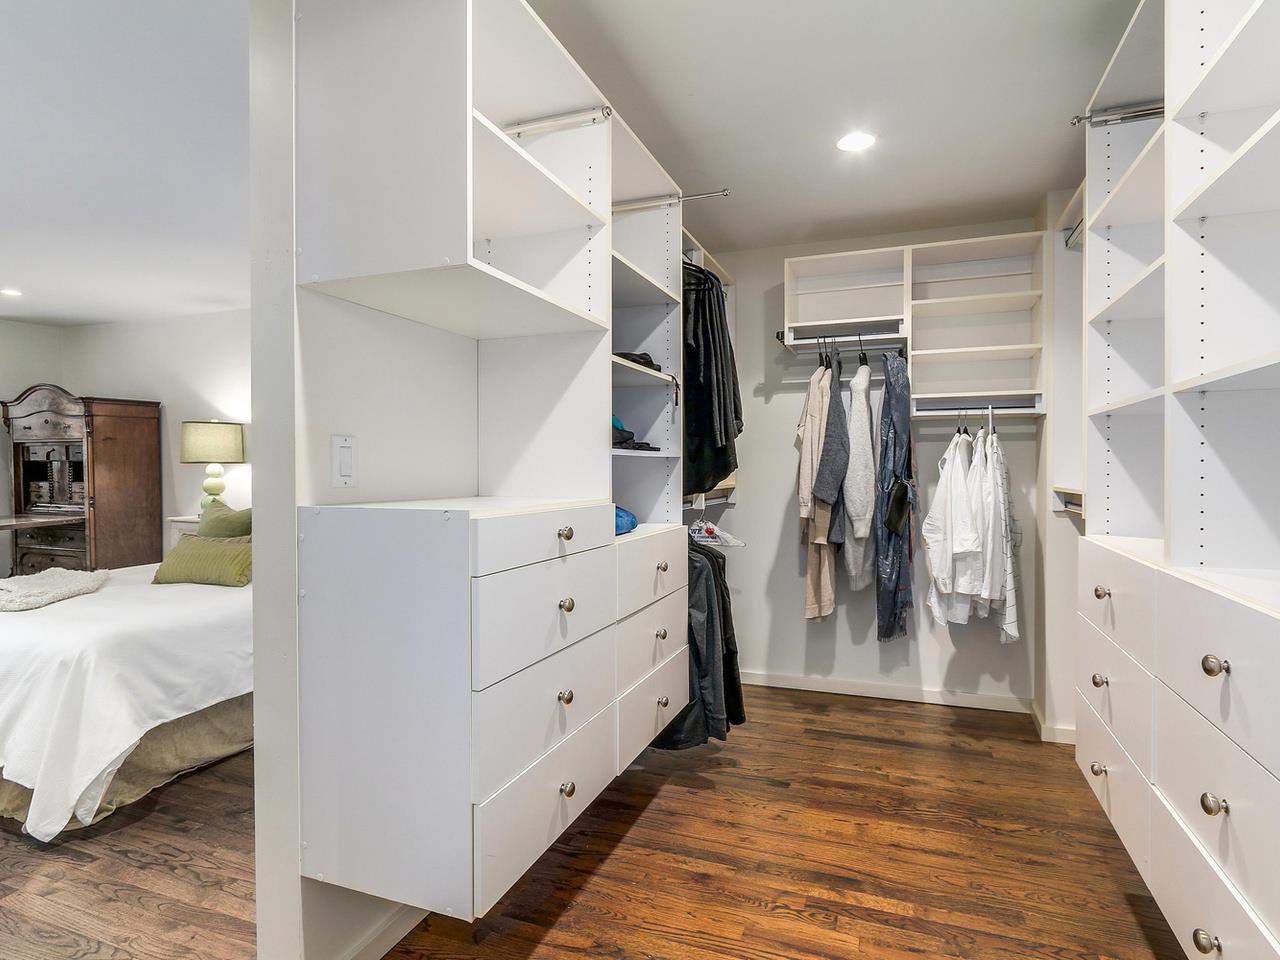 Photo 17: Photos: 3708 EDGEMONT Boulevard in North Vancouver: Edgemont House Fourplex for sale : MLS®# R2138514